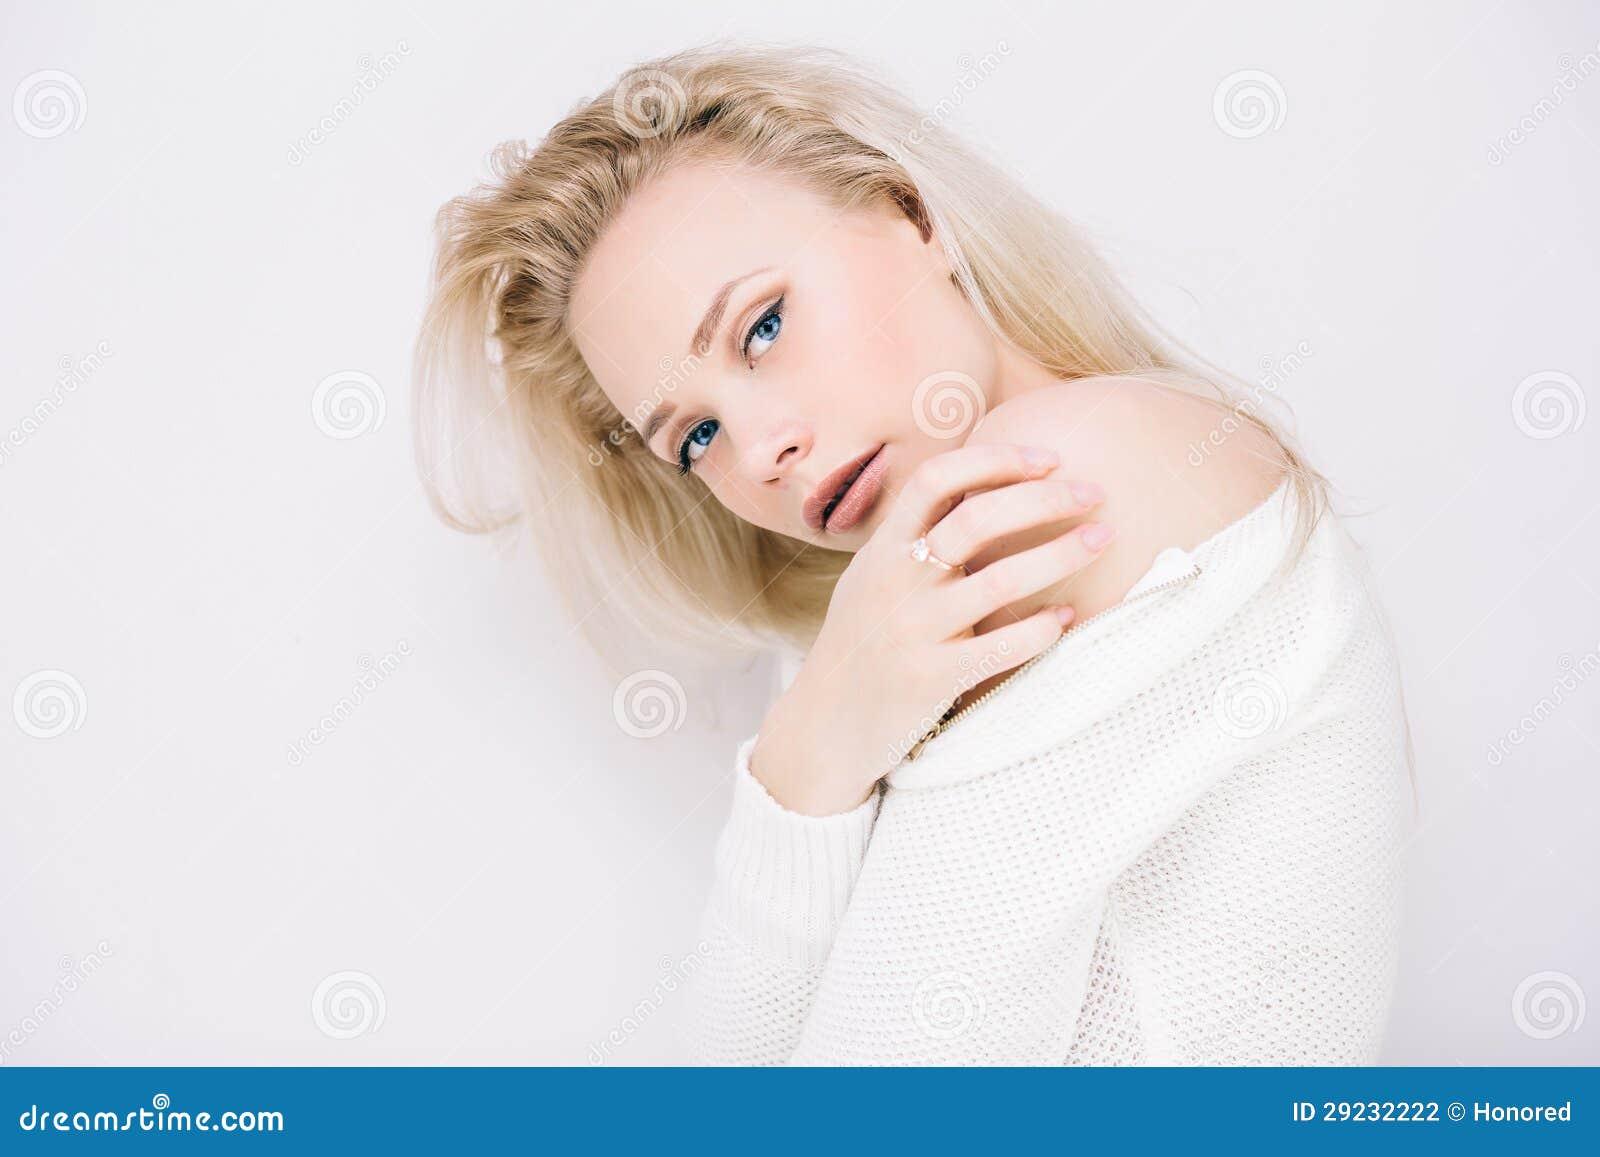 Download Louro sensual foto de stock. Imagem de puro, bonito, blond - 29232222